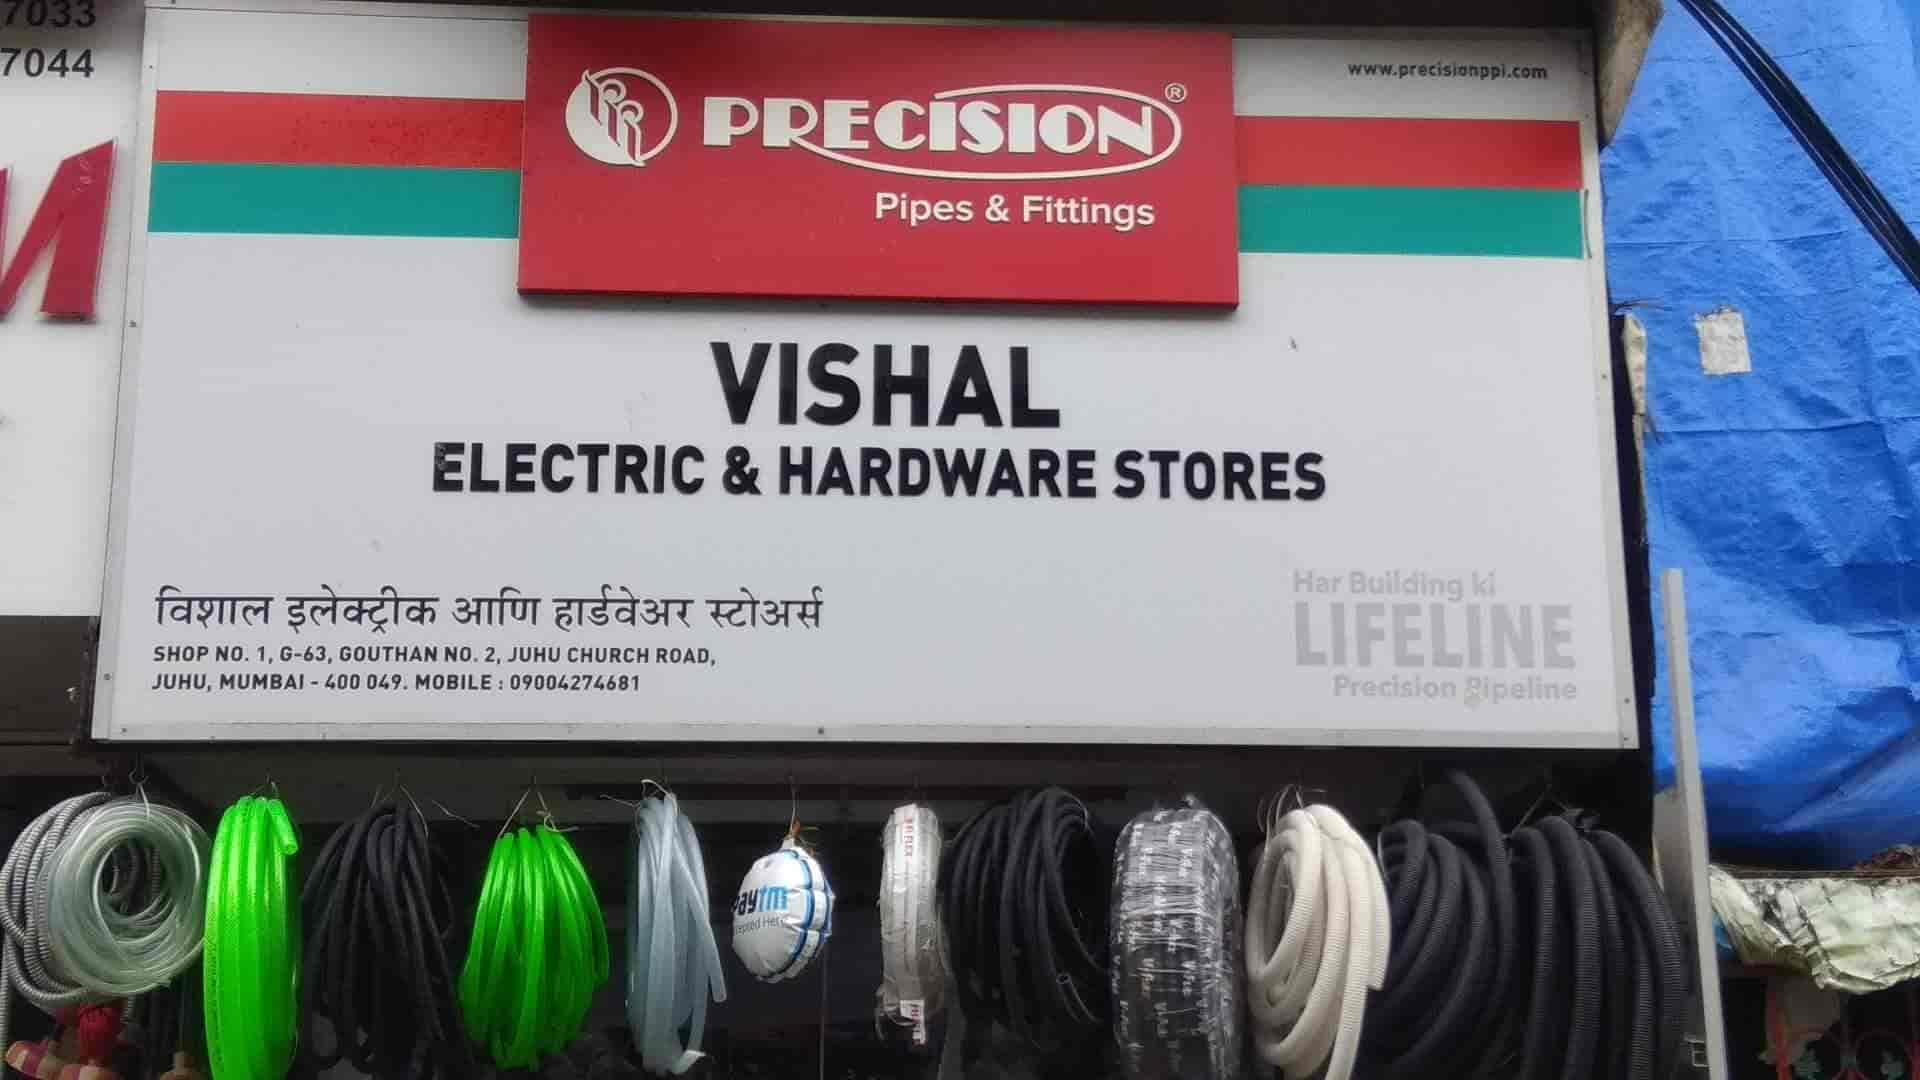 Vishal Electric & Hardware Store, Juhu - Hardware Shops in Mumbai ...